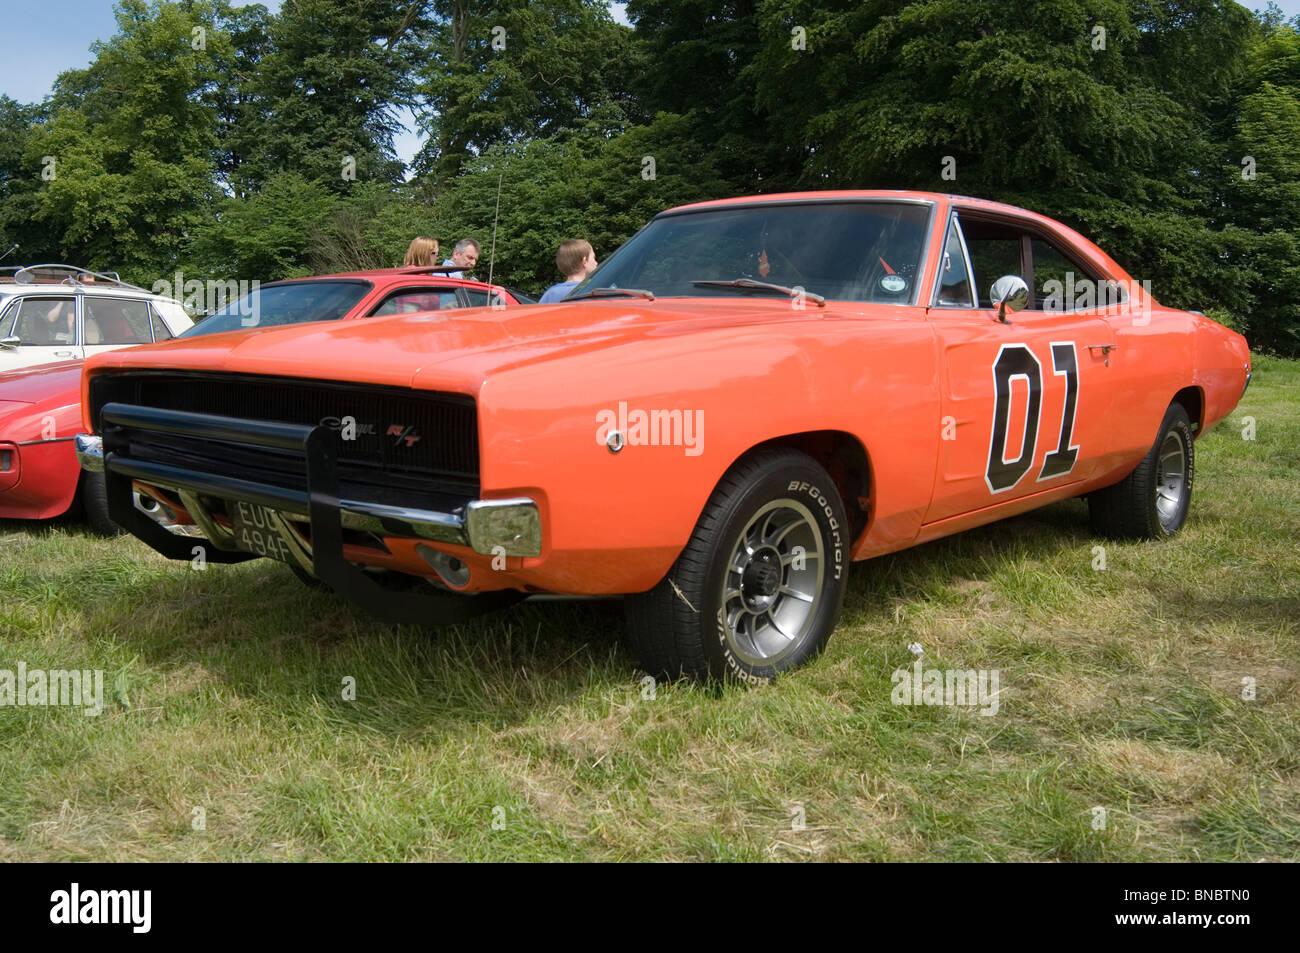 1969 Dodge Charger Mopar General Lee Replica Muscle Car Tv Show